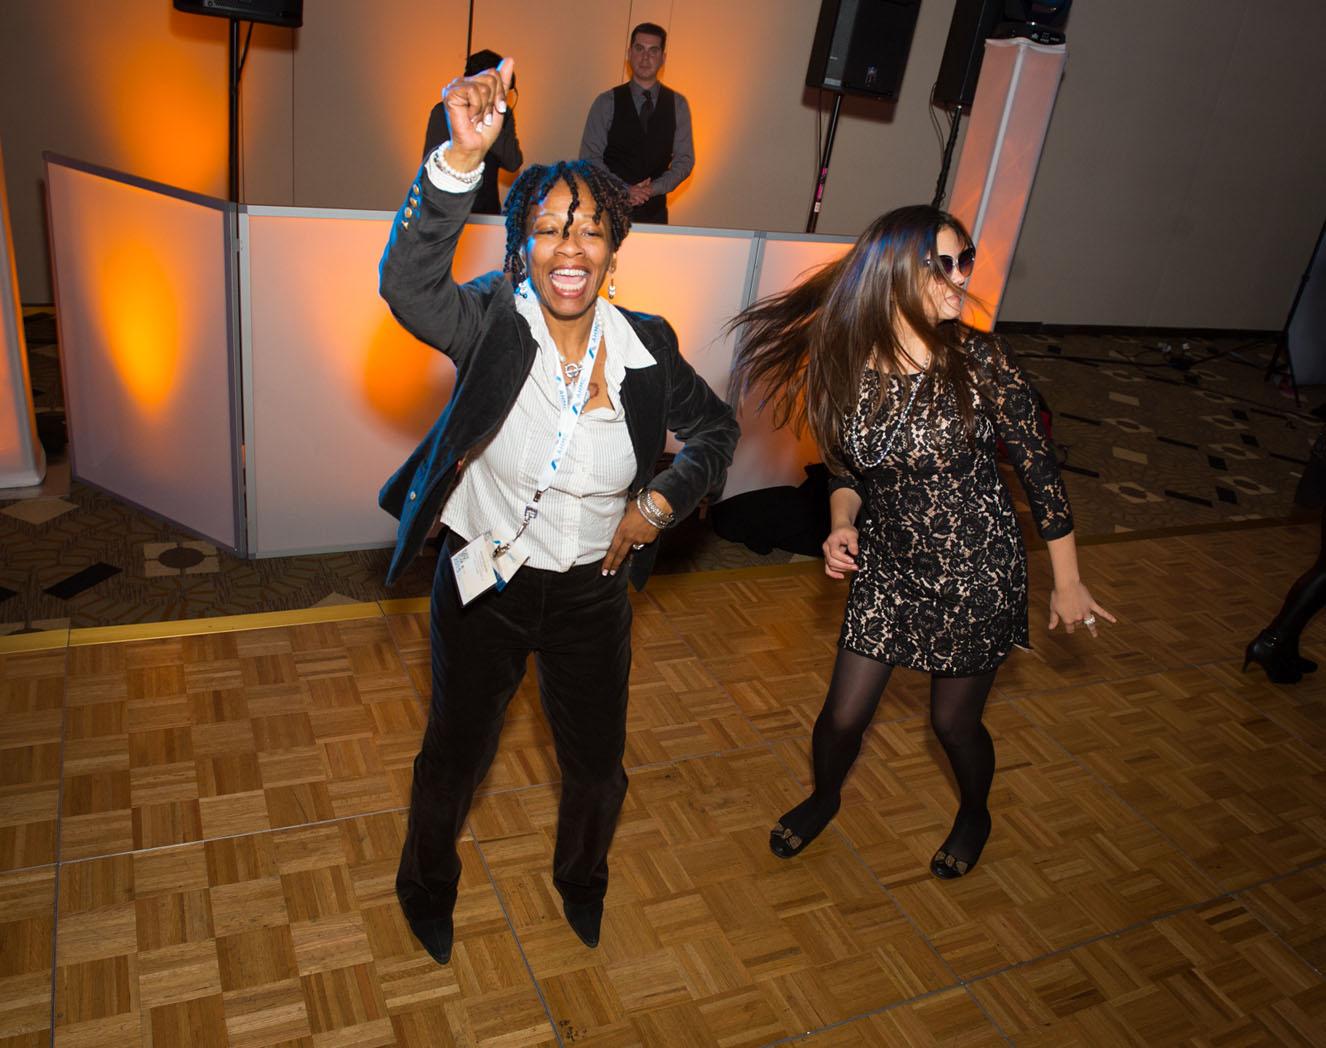 2015-12-09 ReMax Corpoarte Event - The Borgata - Atlantic City NJ - Photo Sesh - 2015-5229.jpg